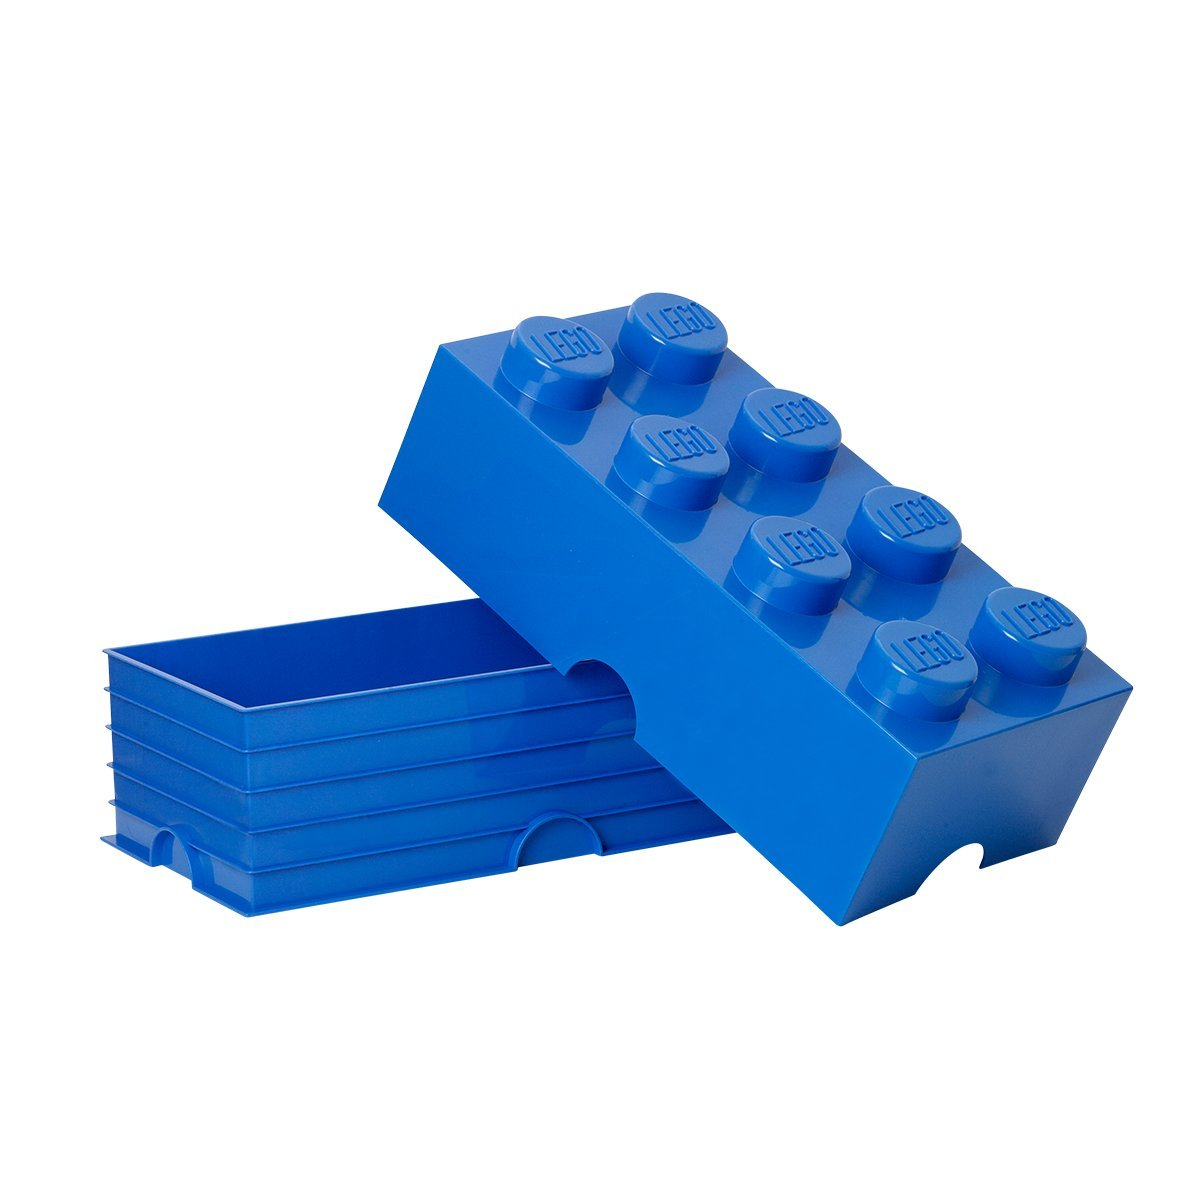 LEGO Brick 8 Storage Box One Size Blue